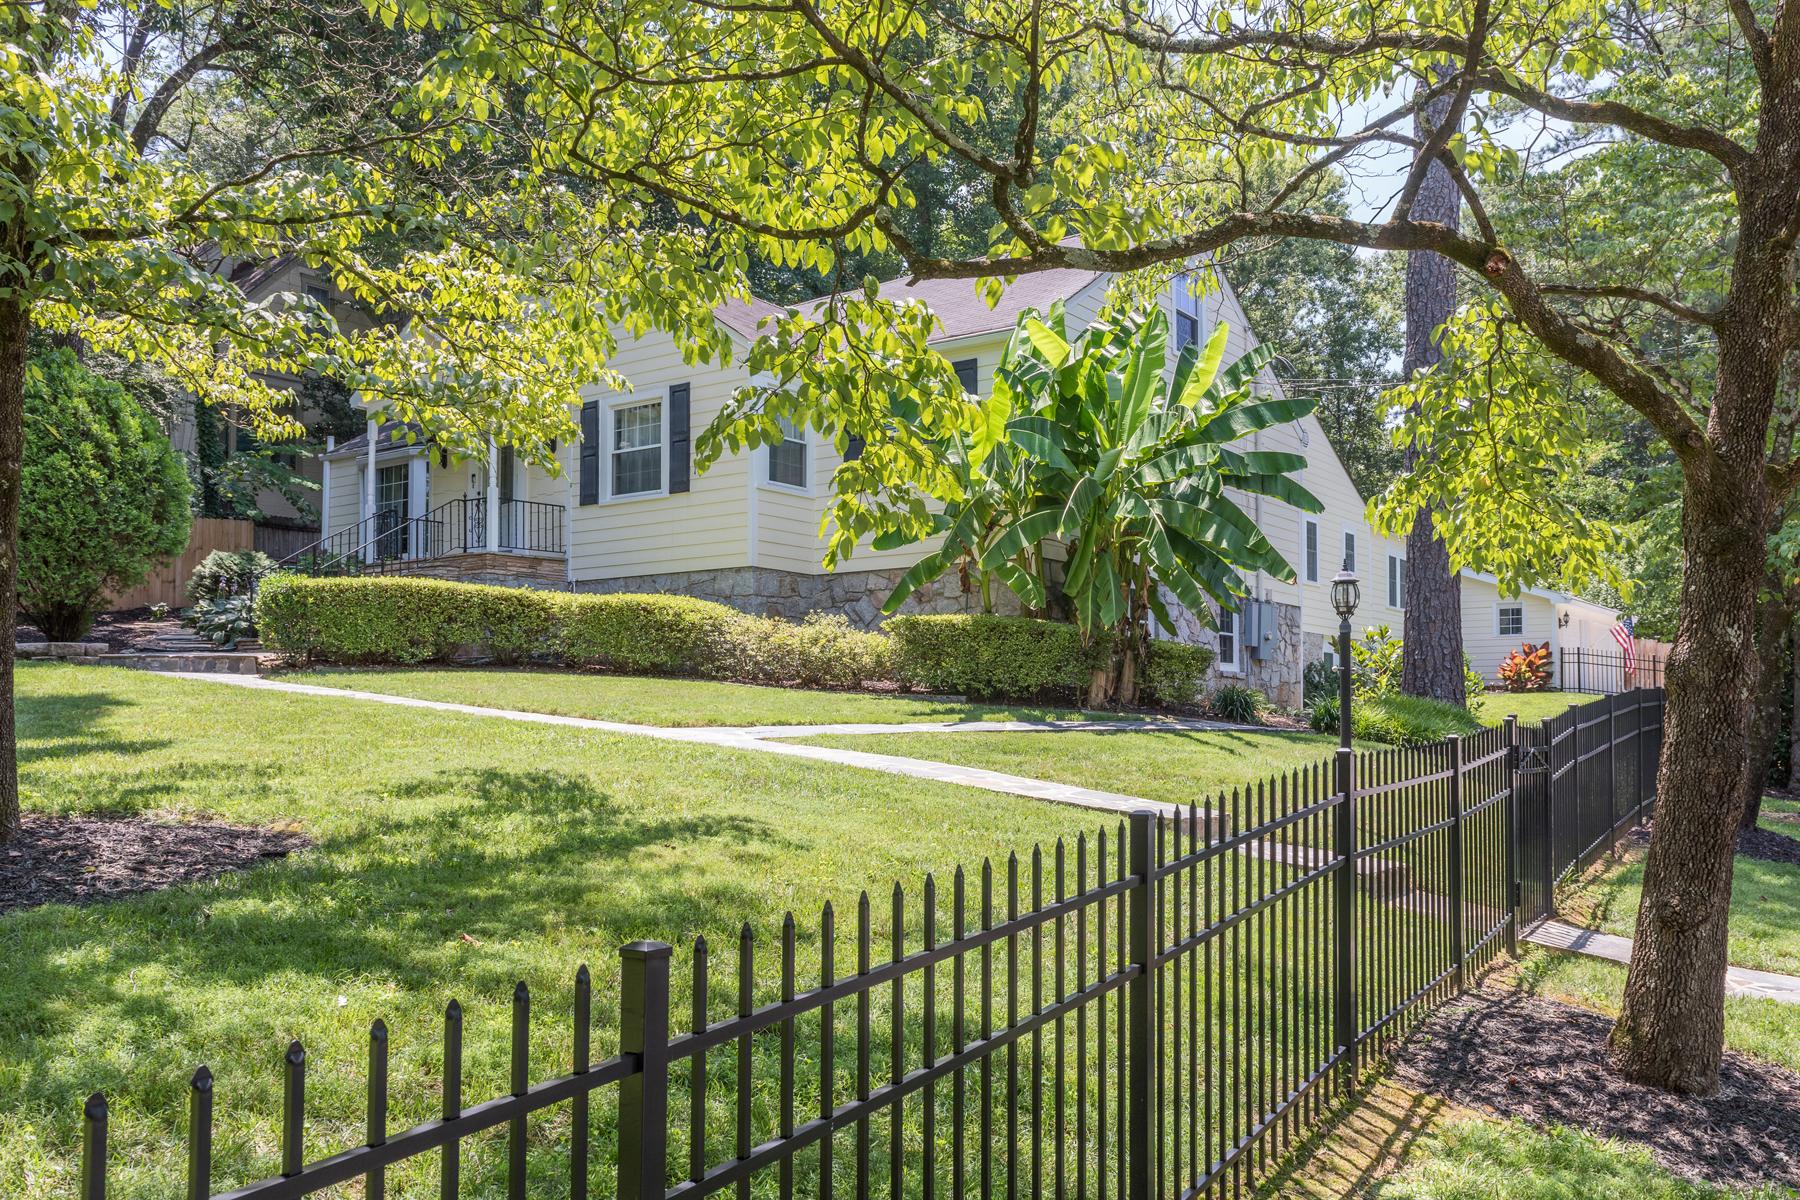 Single Family Home for Sale at Tranquil Buckhead Oasis 4228 Wieuca Road NE North Buckhead, Atlanta, Georgia, 30342 United States